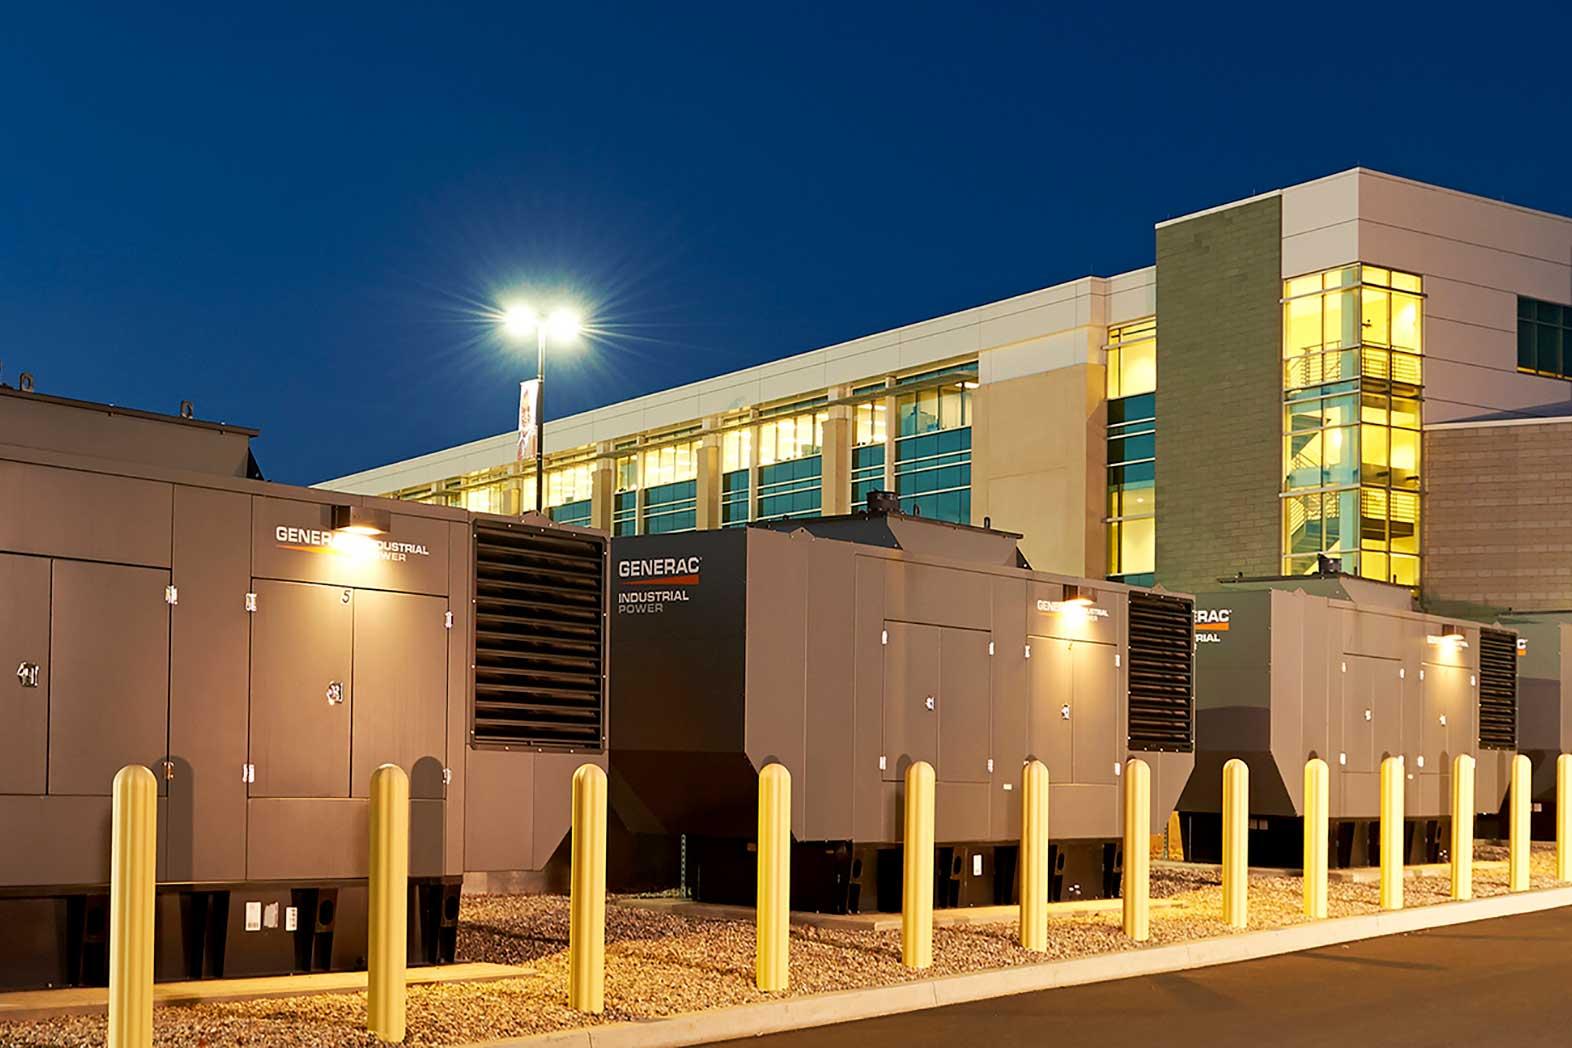 Generac Generator, Industrial Bi-Fuel, HM Cragg